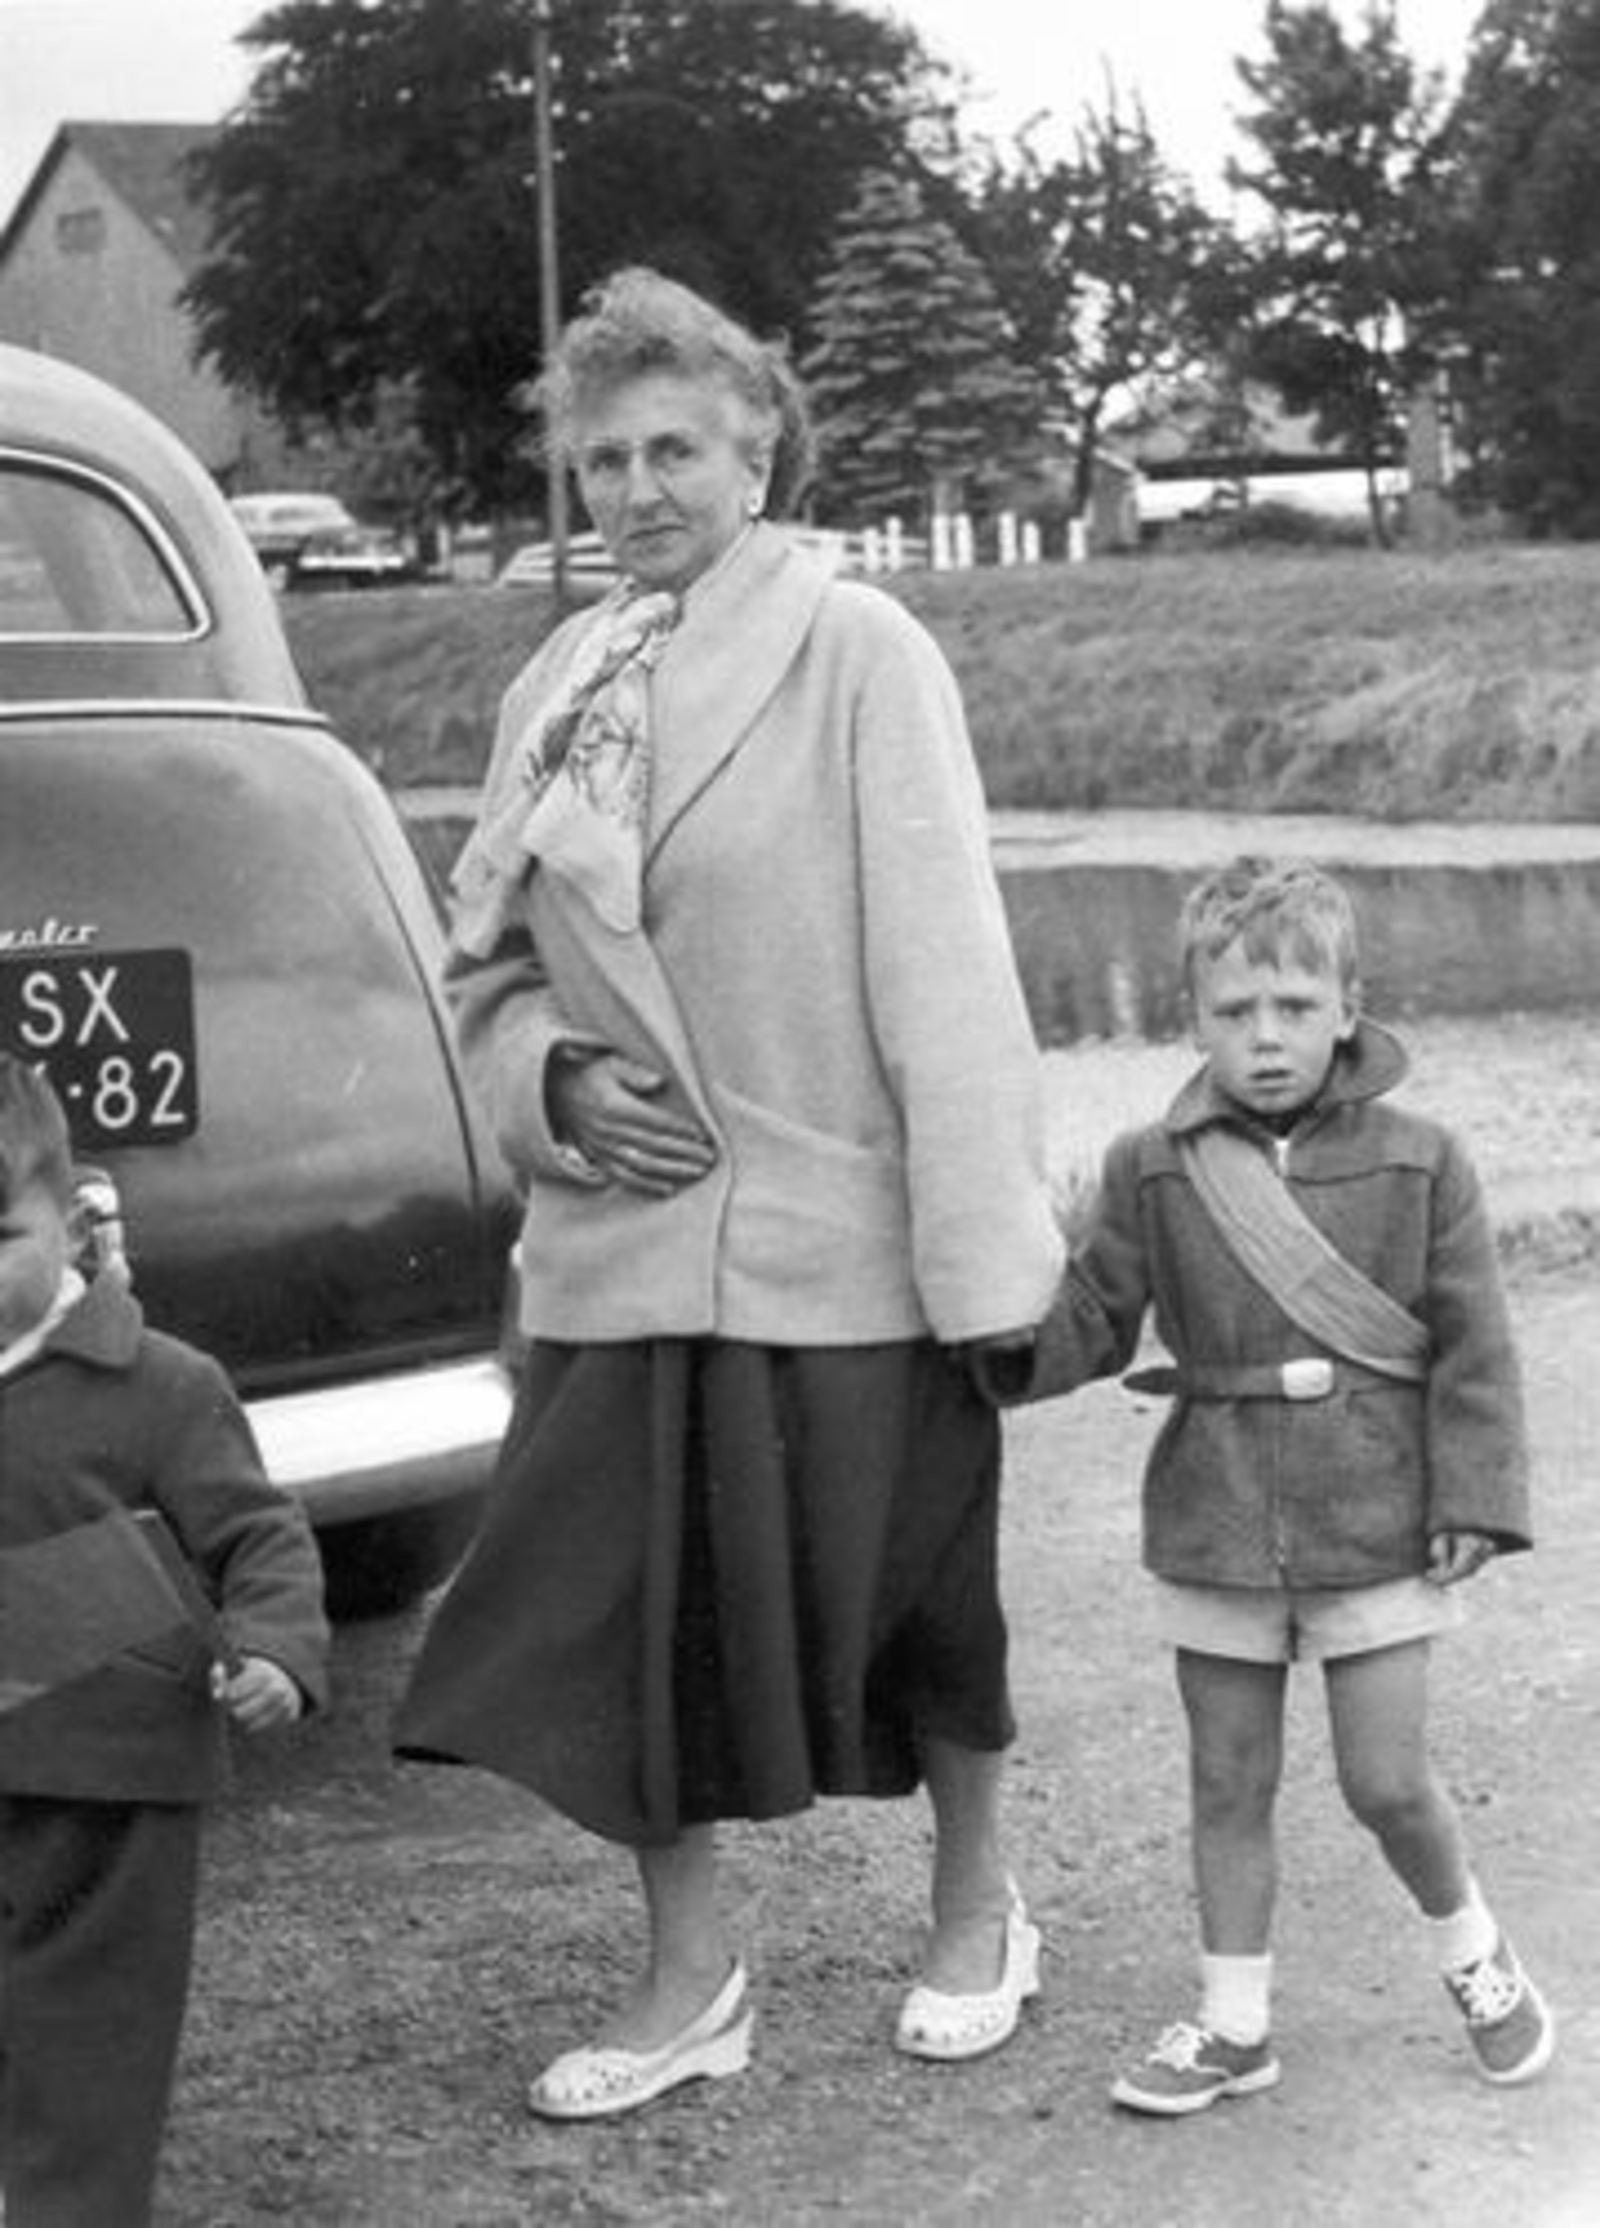 Schreuders-Feeleus Jannie 1956± met zoon Cok